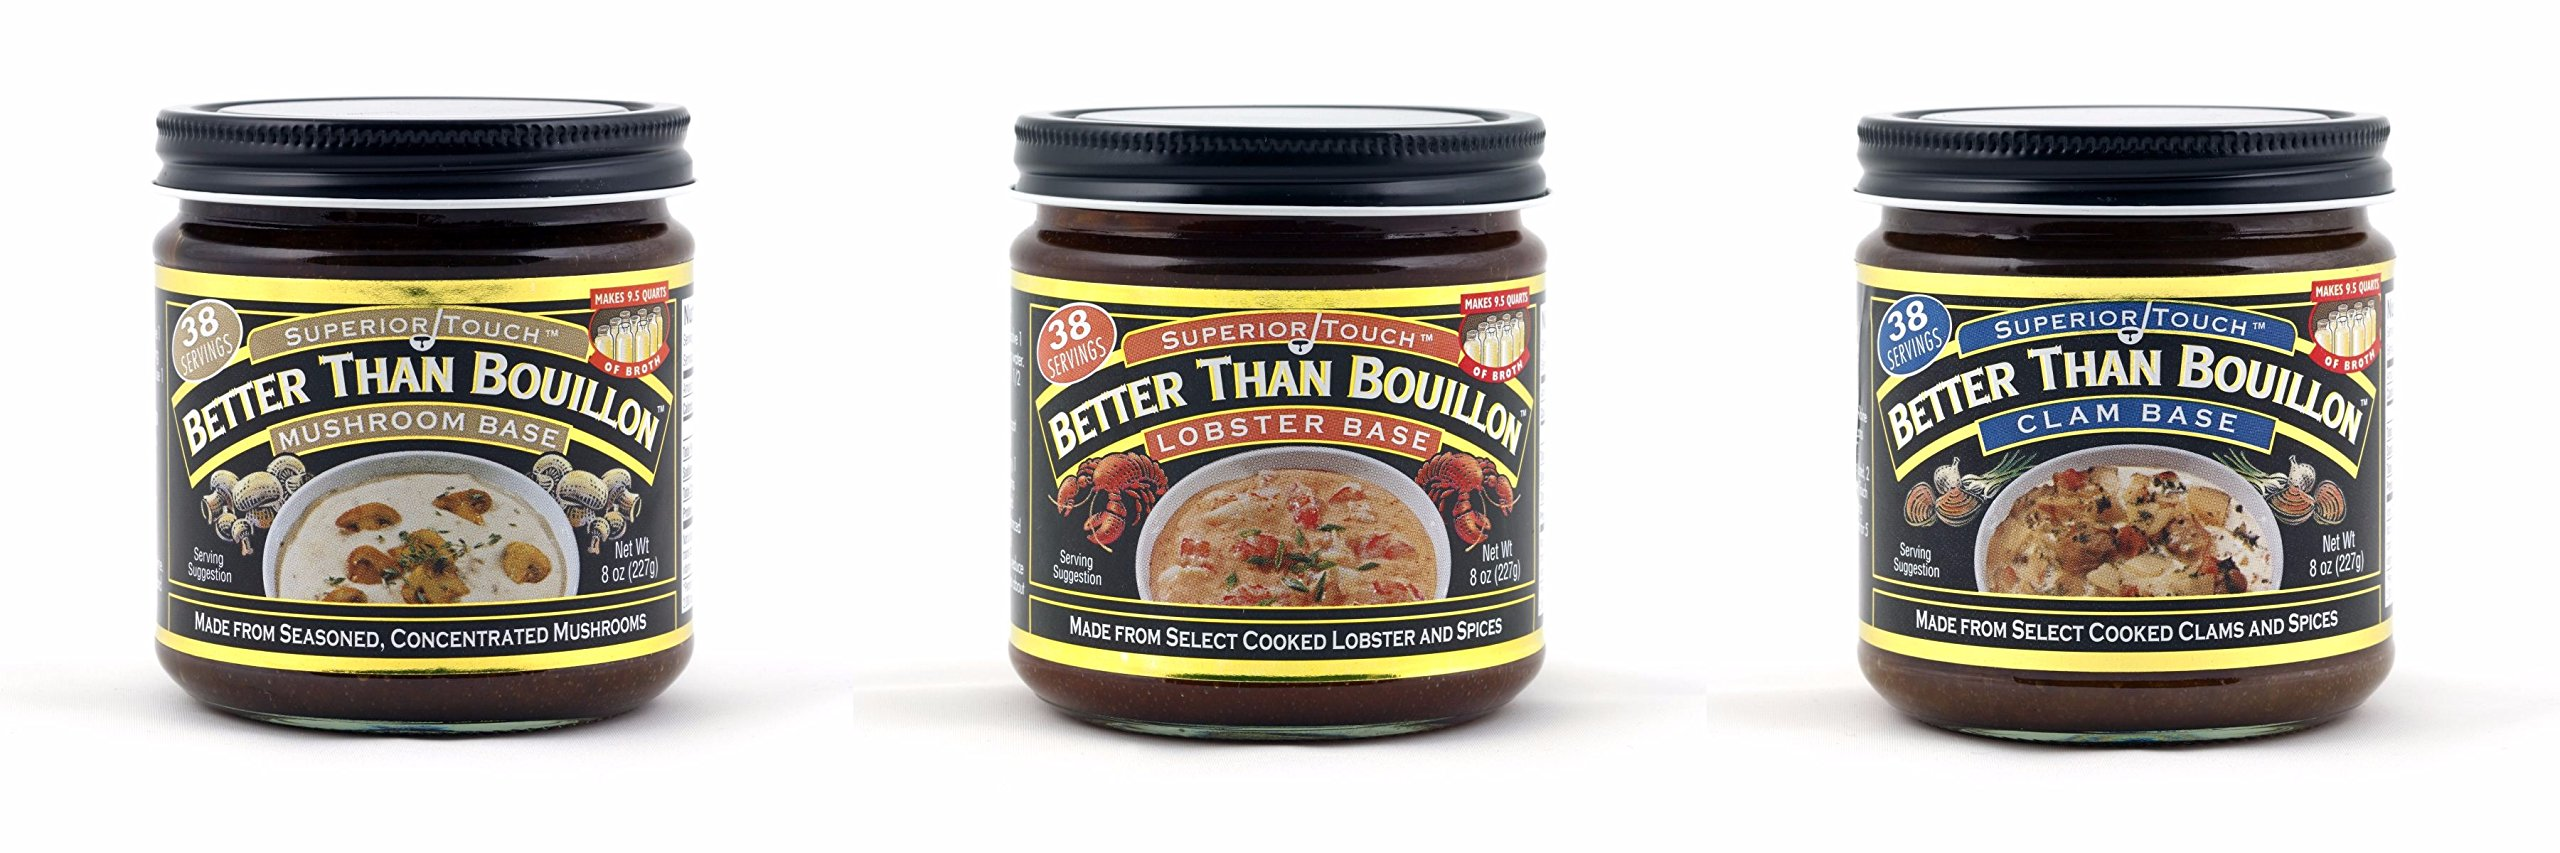 Bundle of 3: Better Than Bouillon Mushroom Base, Lobster Base, Clam Base